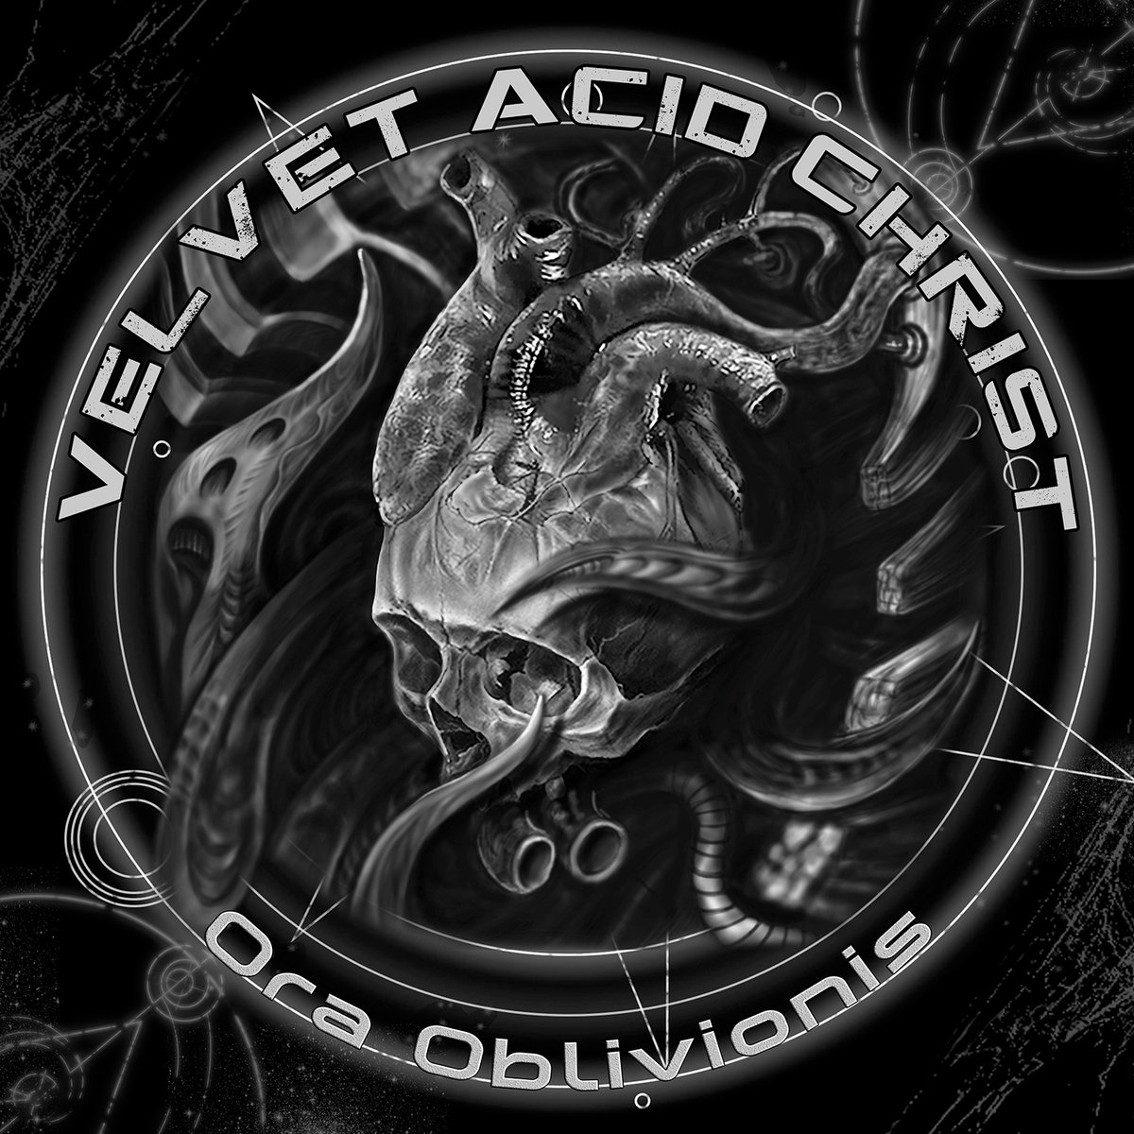 Velvet Acid Christ set to release 'Ora Oblivionis' - incl. early unreleased tracks on bonus CD